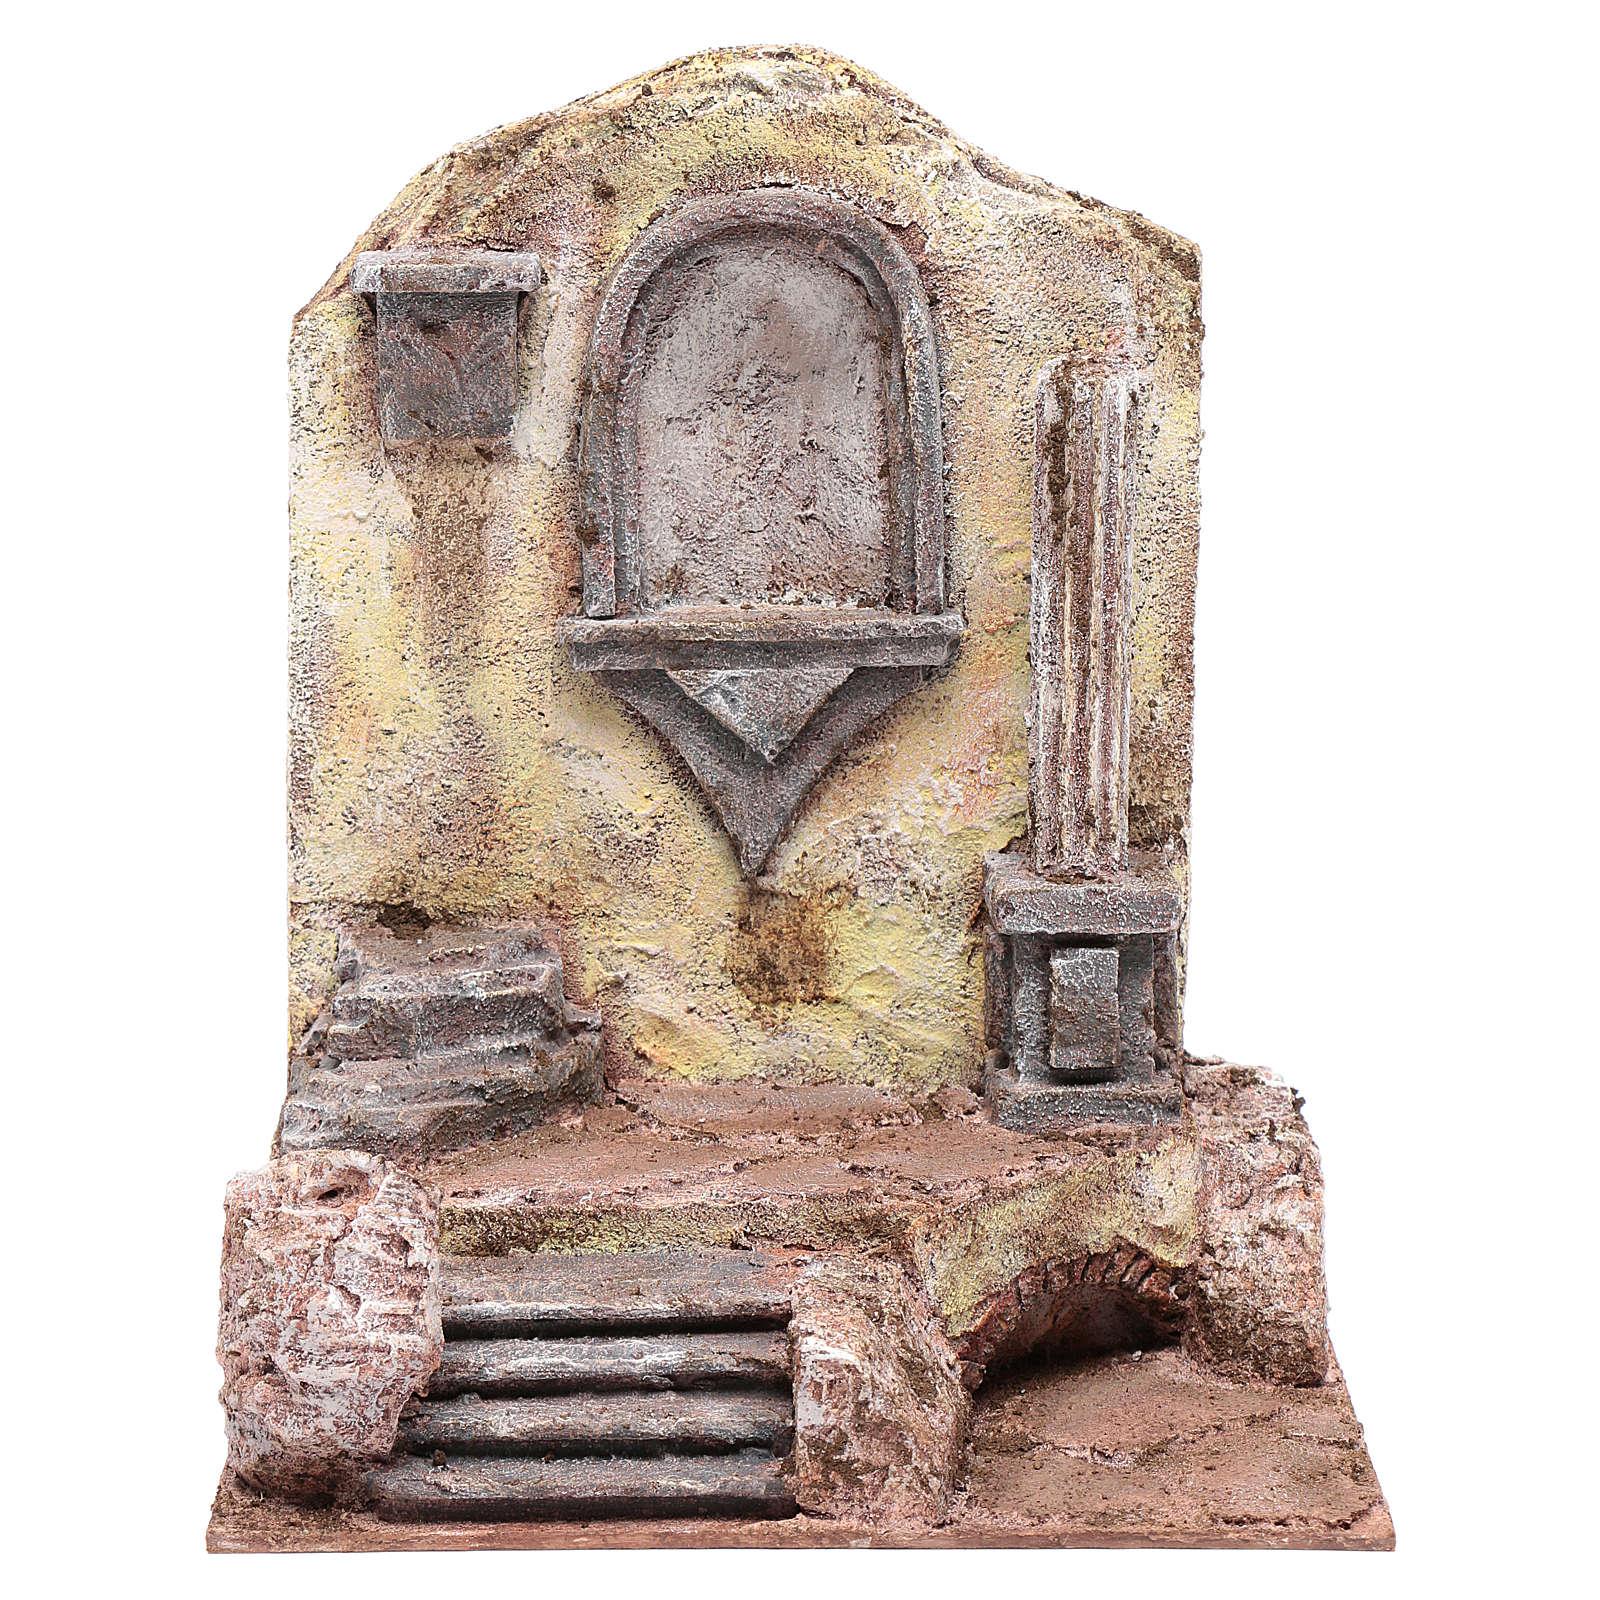 Ruines temple avec niche 29,5x24x18 cm 4